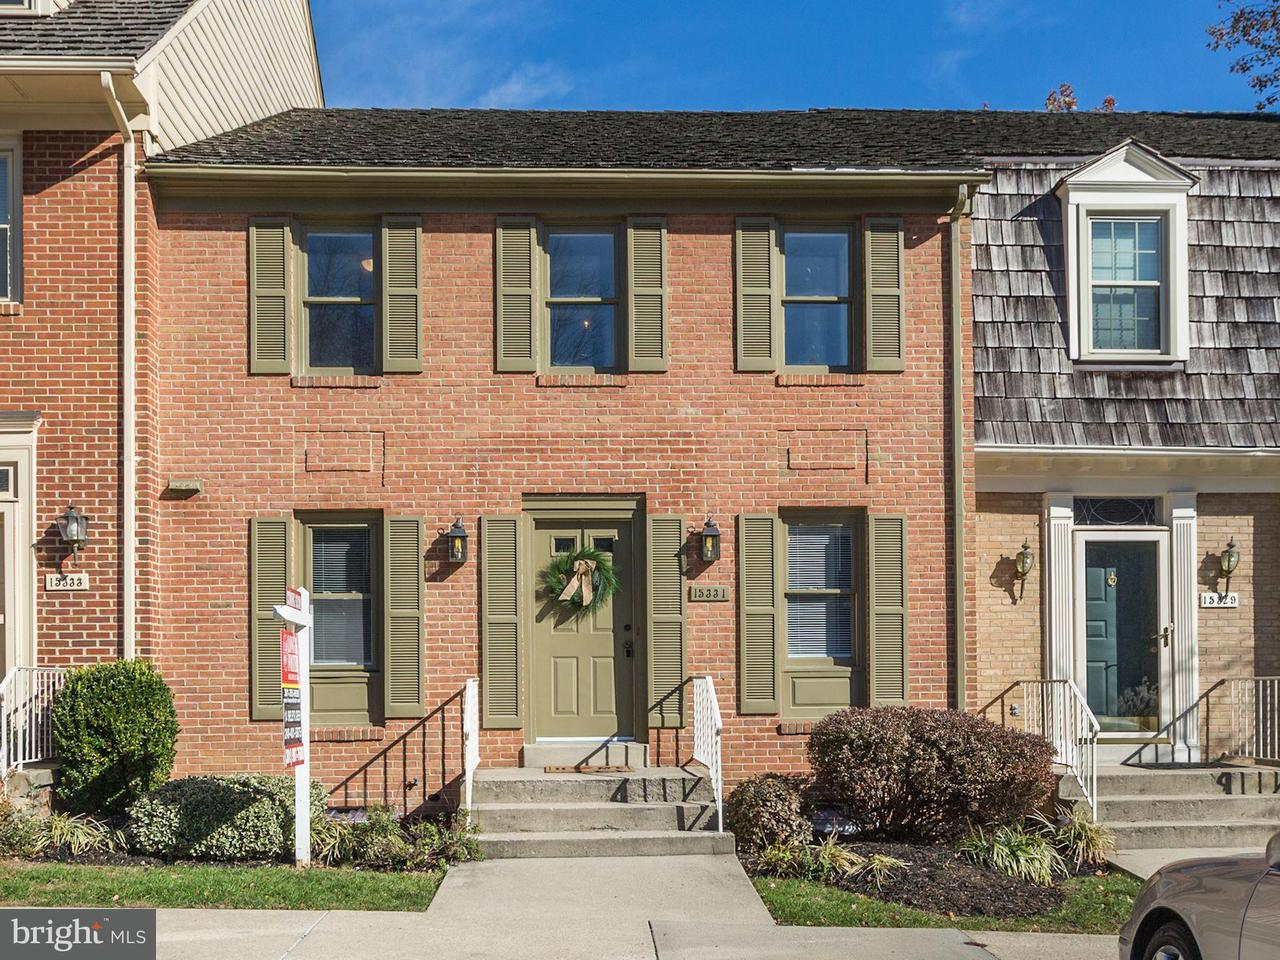 Townhouse for Sale at 15331 MANOR VILLAGE Lane 15331 MANOR VILLAGE Lane Rockville, Maryland 20853 United States